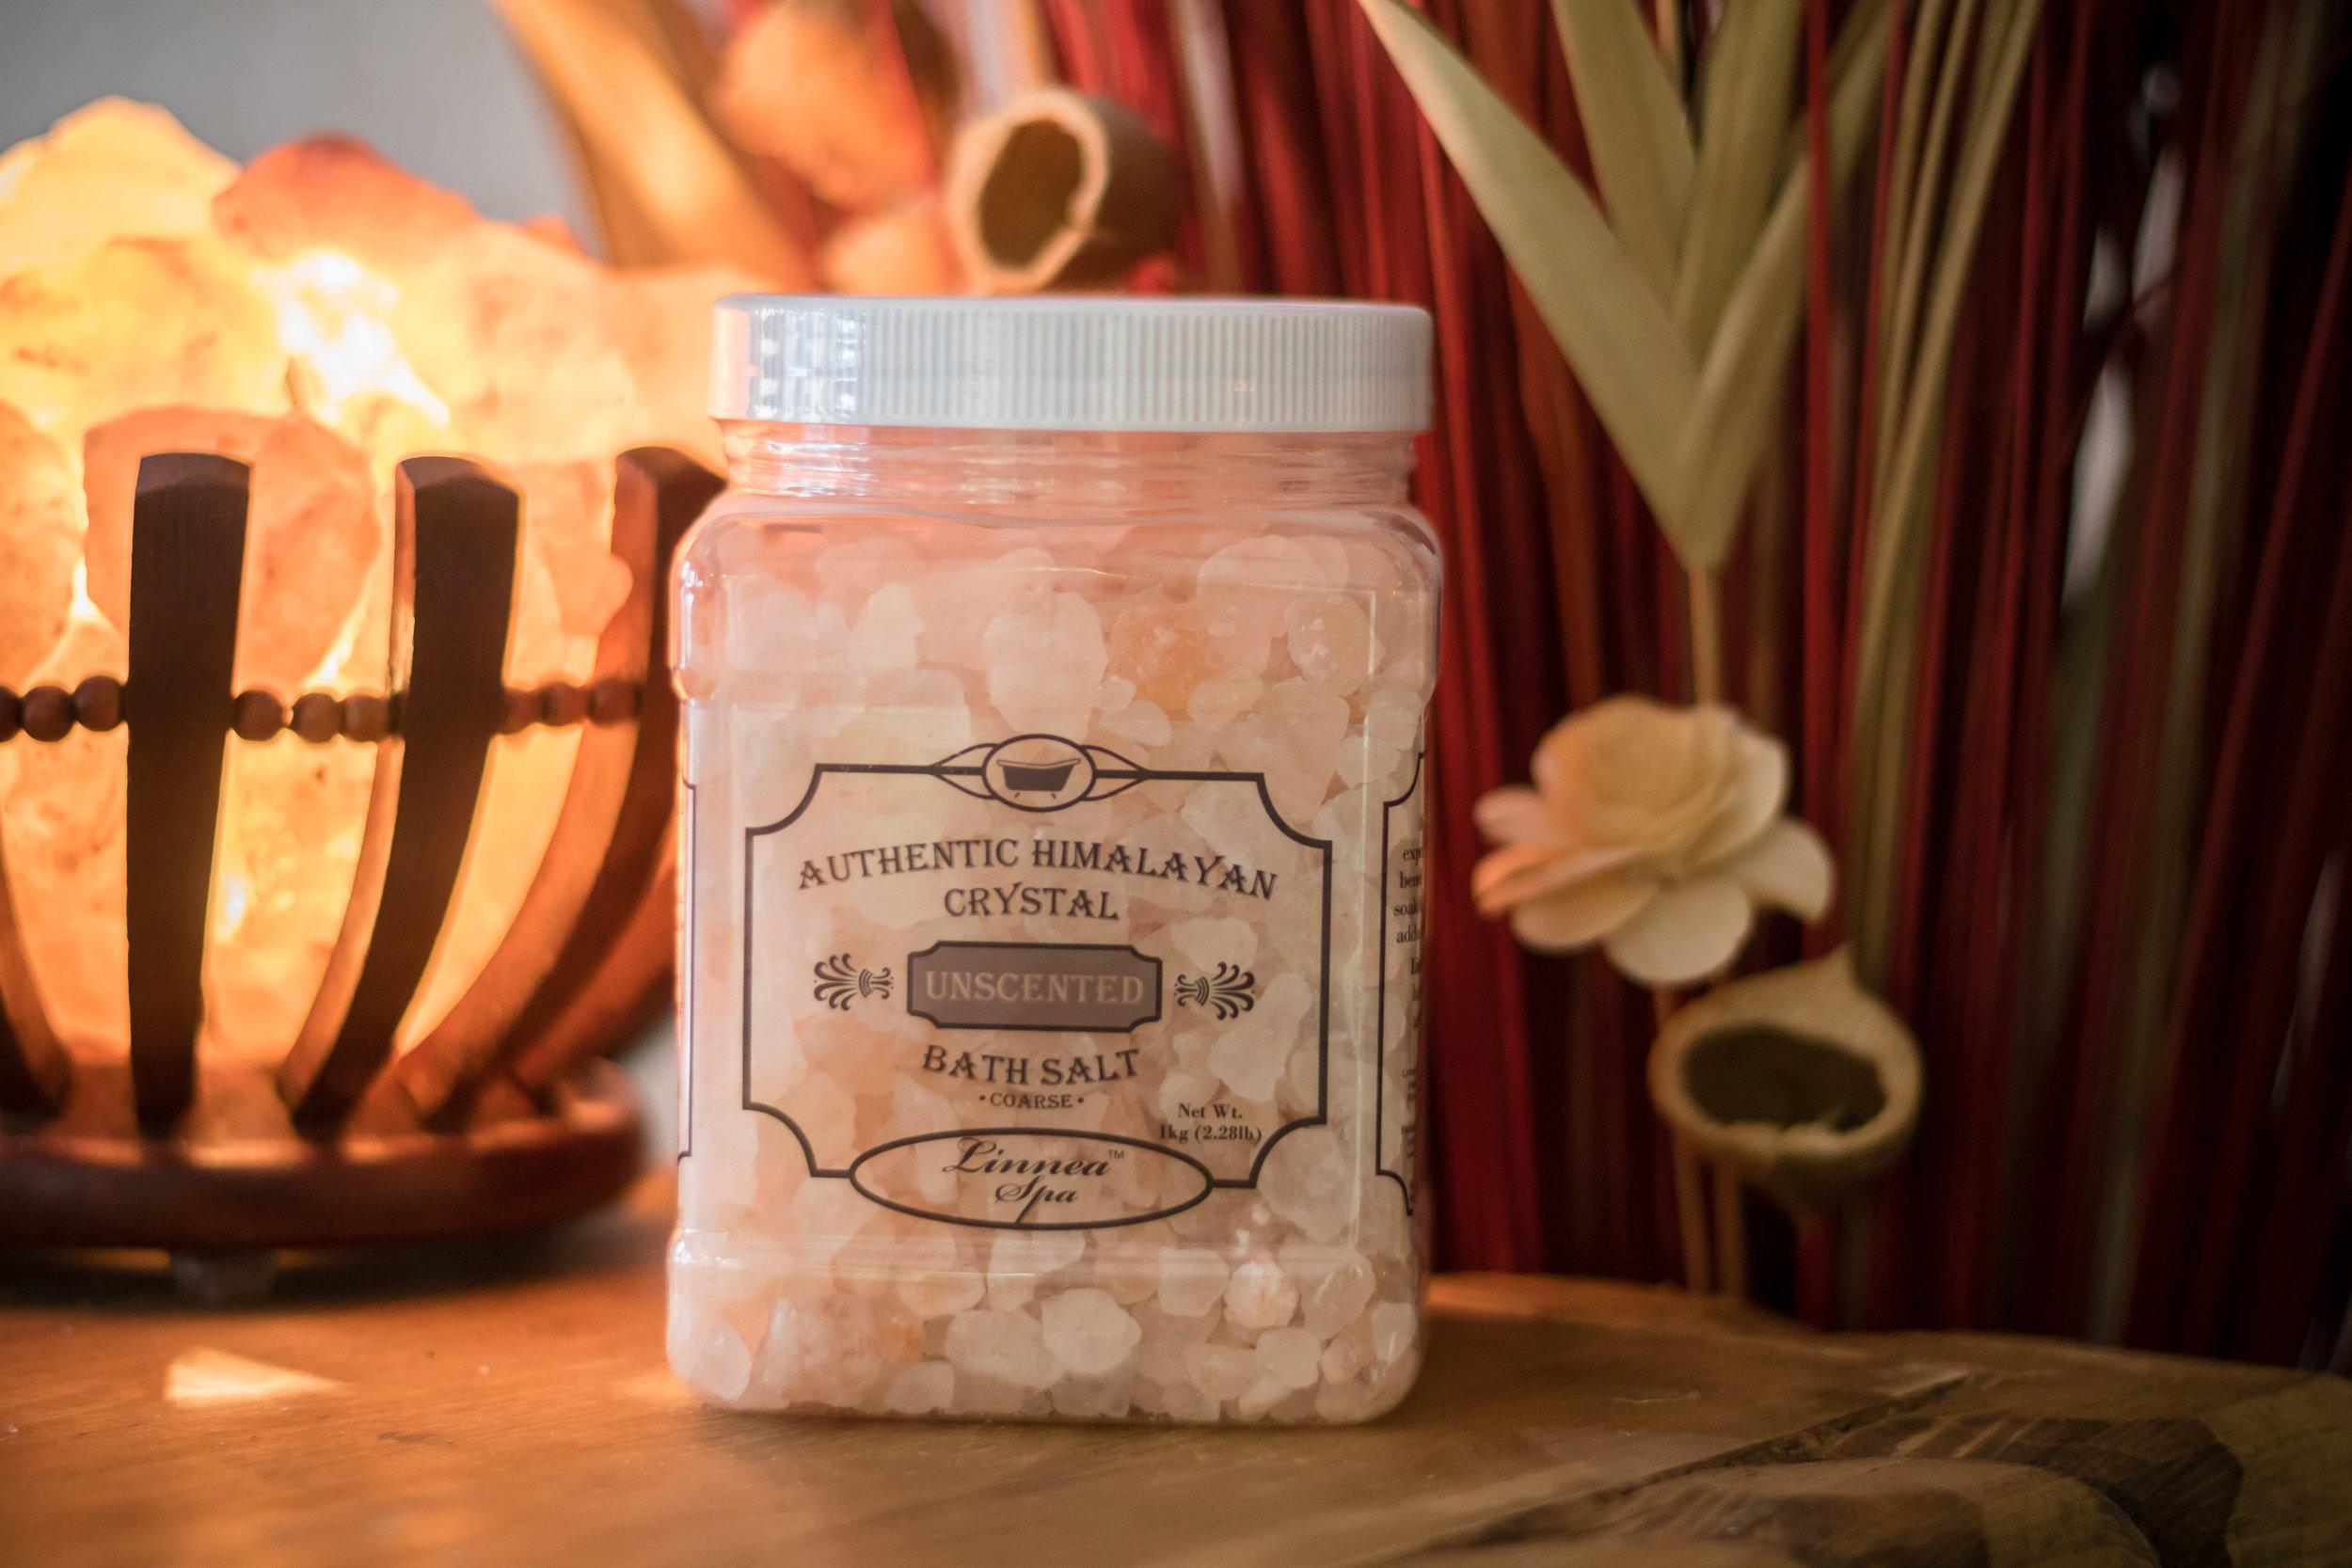 Himalayan Crystal Bath Salt